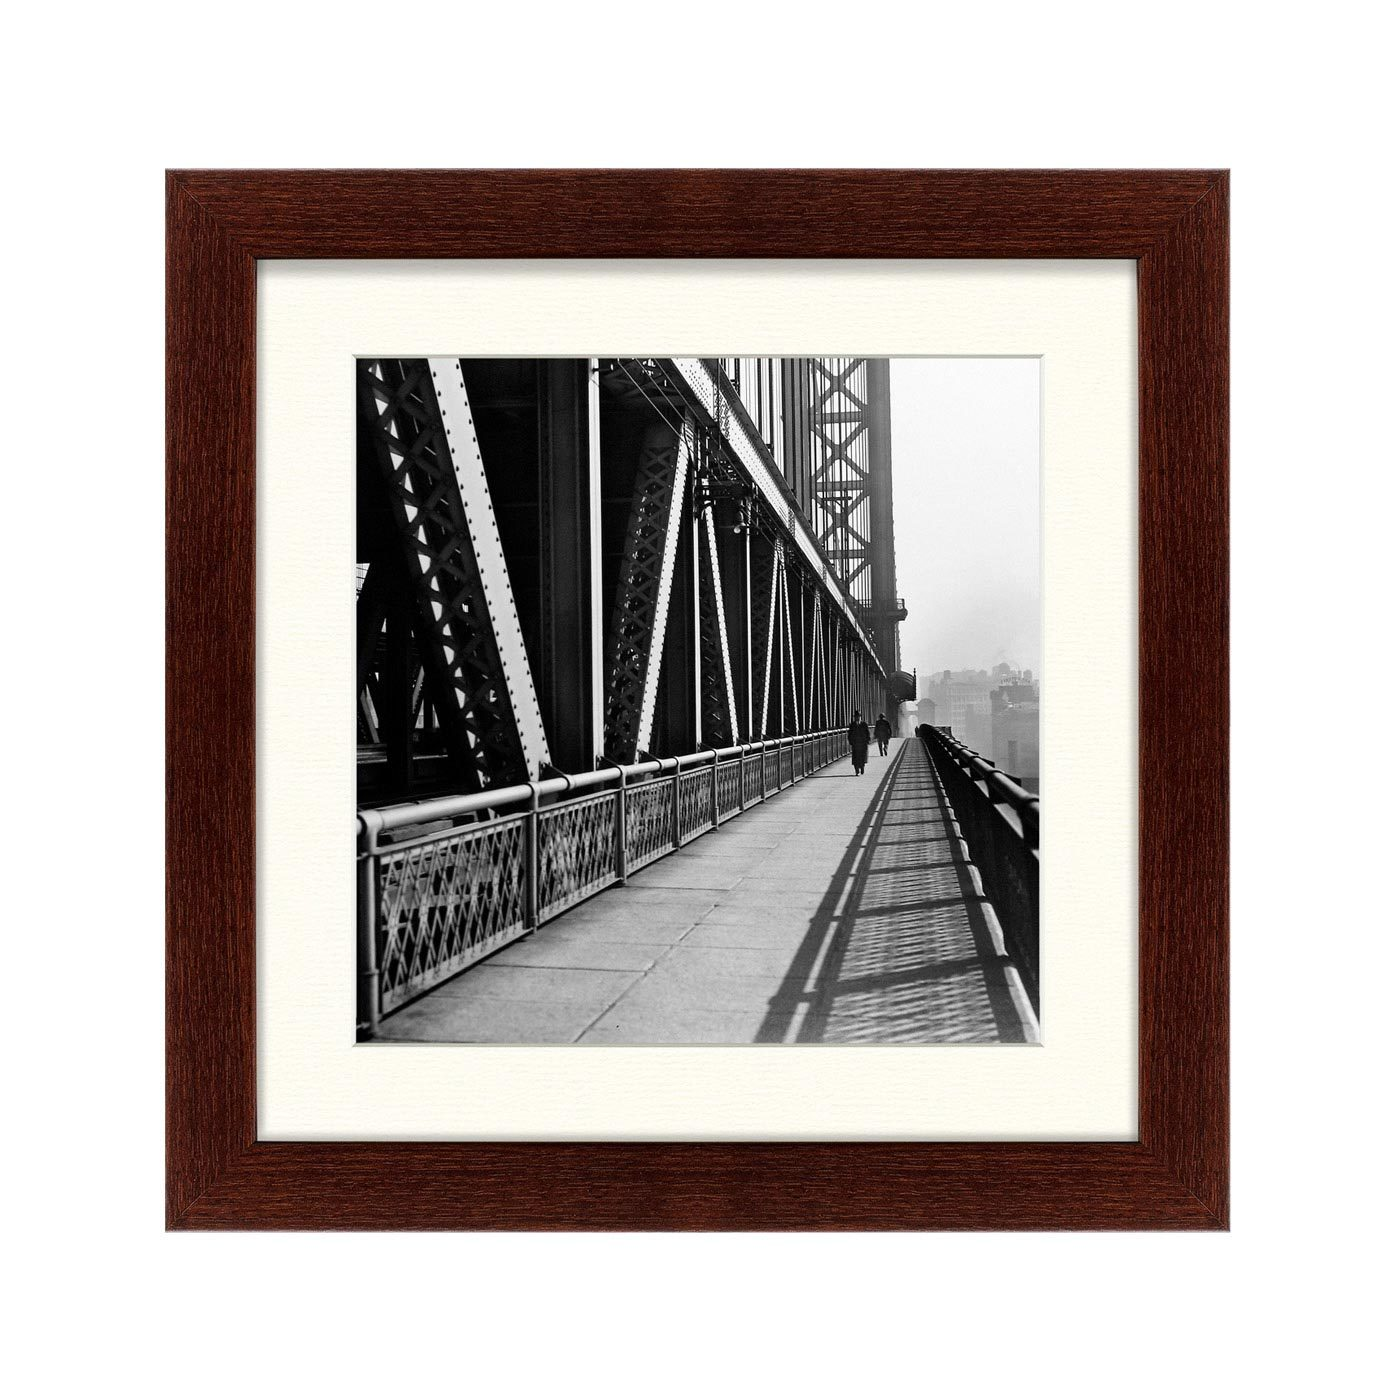 {} Картины в Квартиру Картина Манхэттенский Мост (35х35 см) мне предлагают 1комнат квартиру